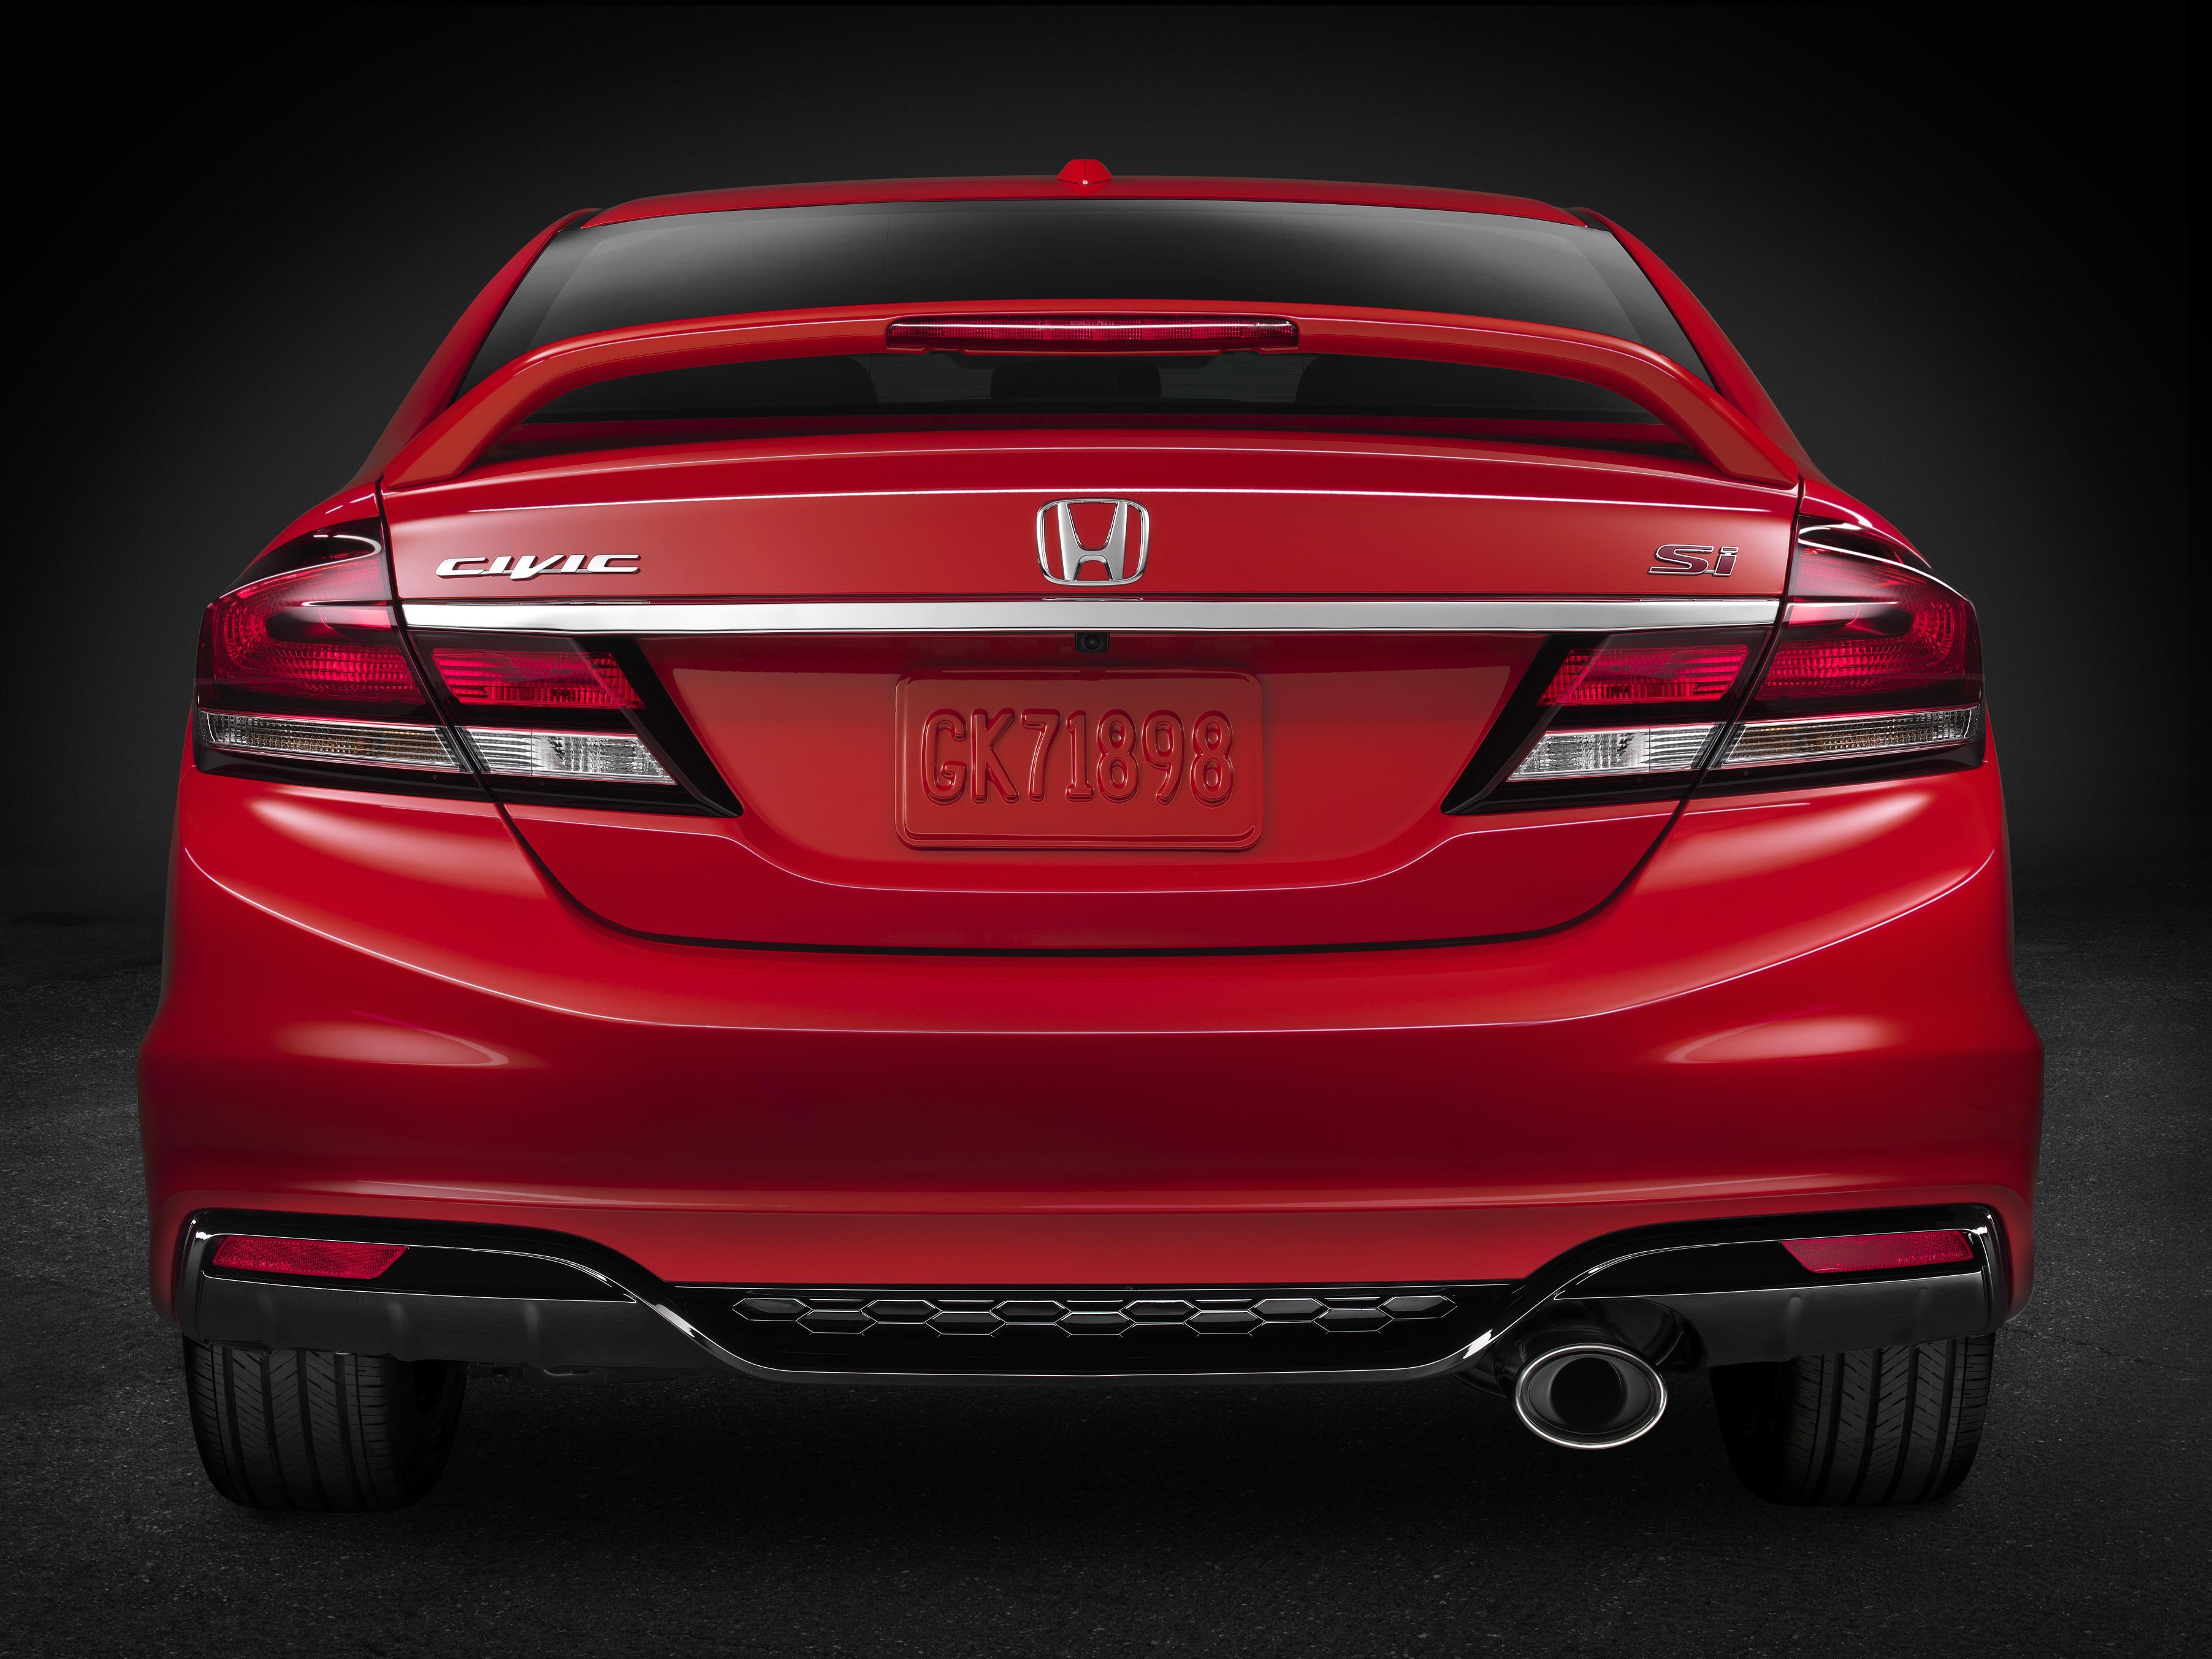 2015 Honda Civic Si is $100 More Than the 2014 Model - autoevolution